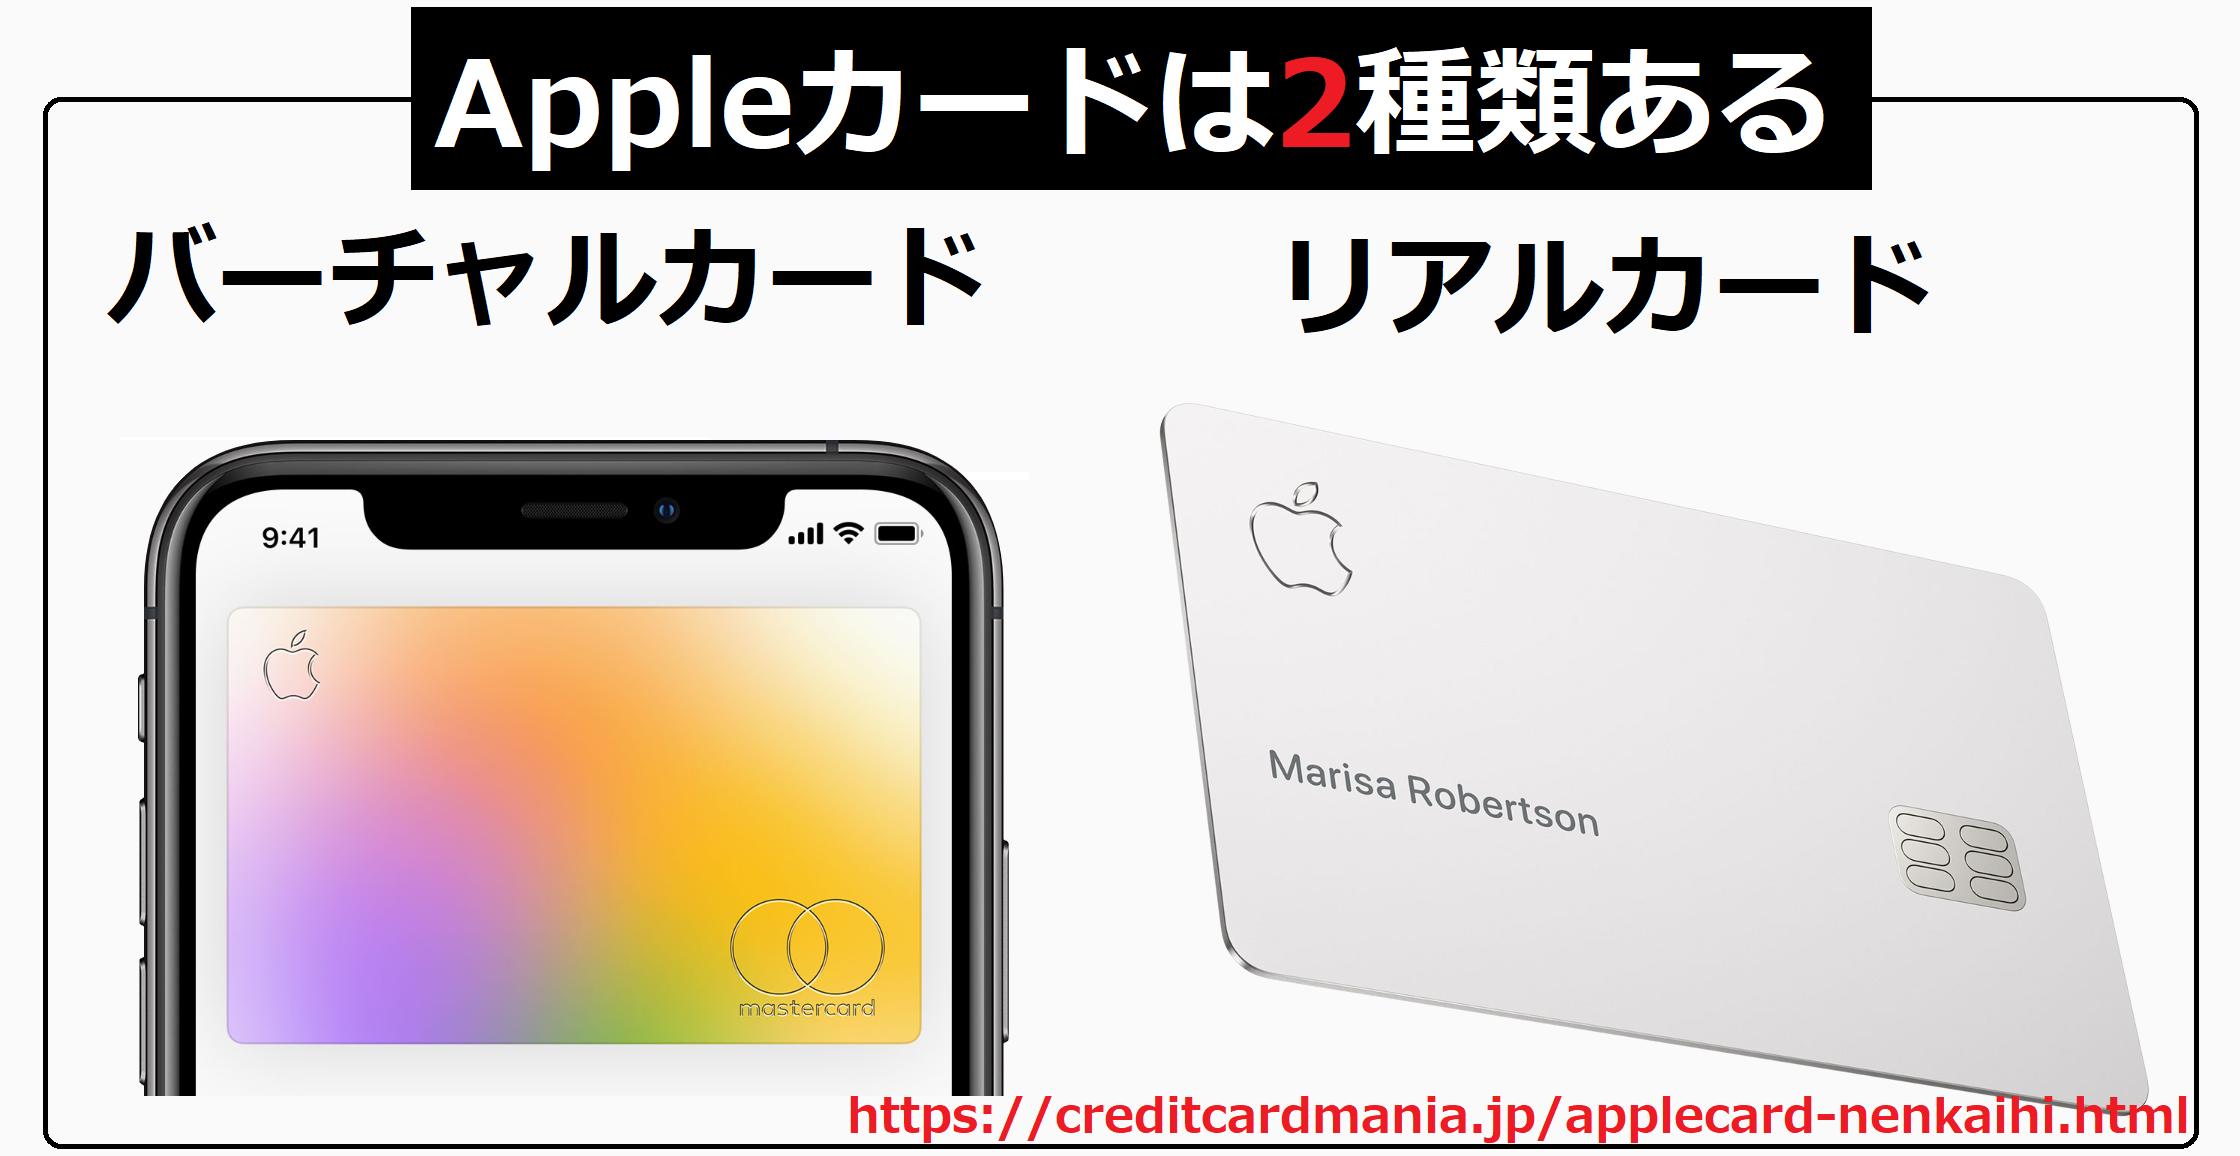 Appleカードはバーチャルカードとリアルカードの2種類ある